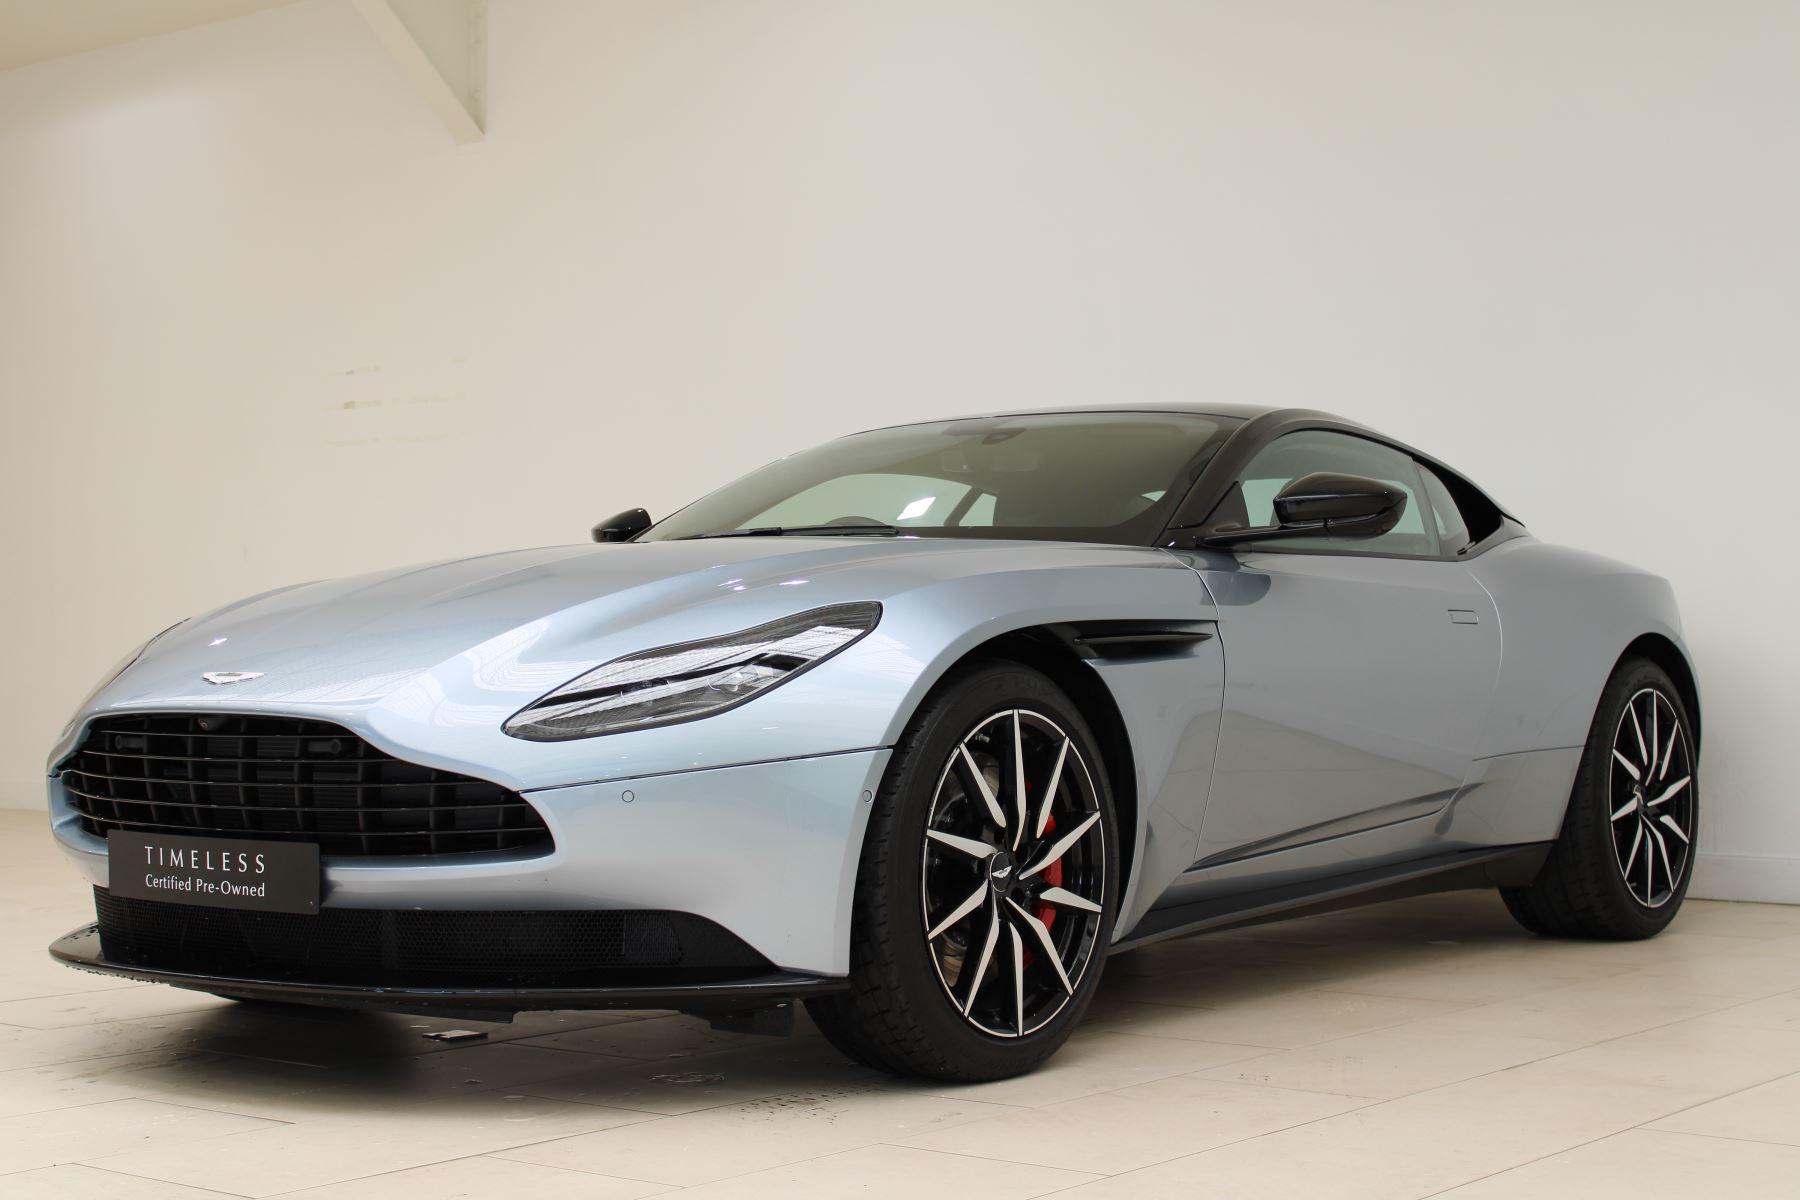 Aston Martin DB11 V8 2dr Touchtronic Auto image 1